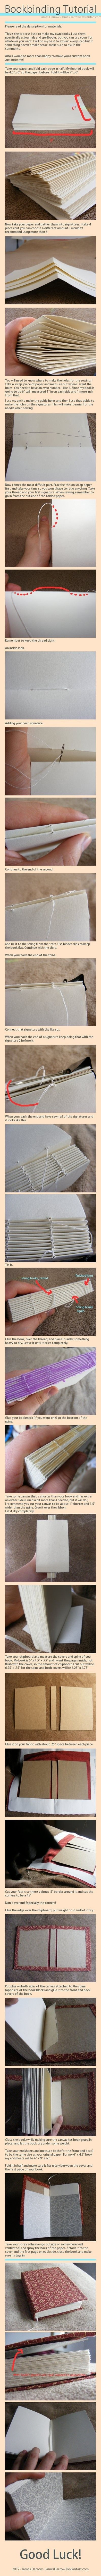 book binding tutorial.